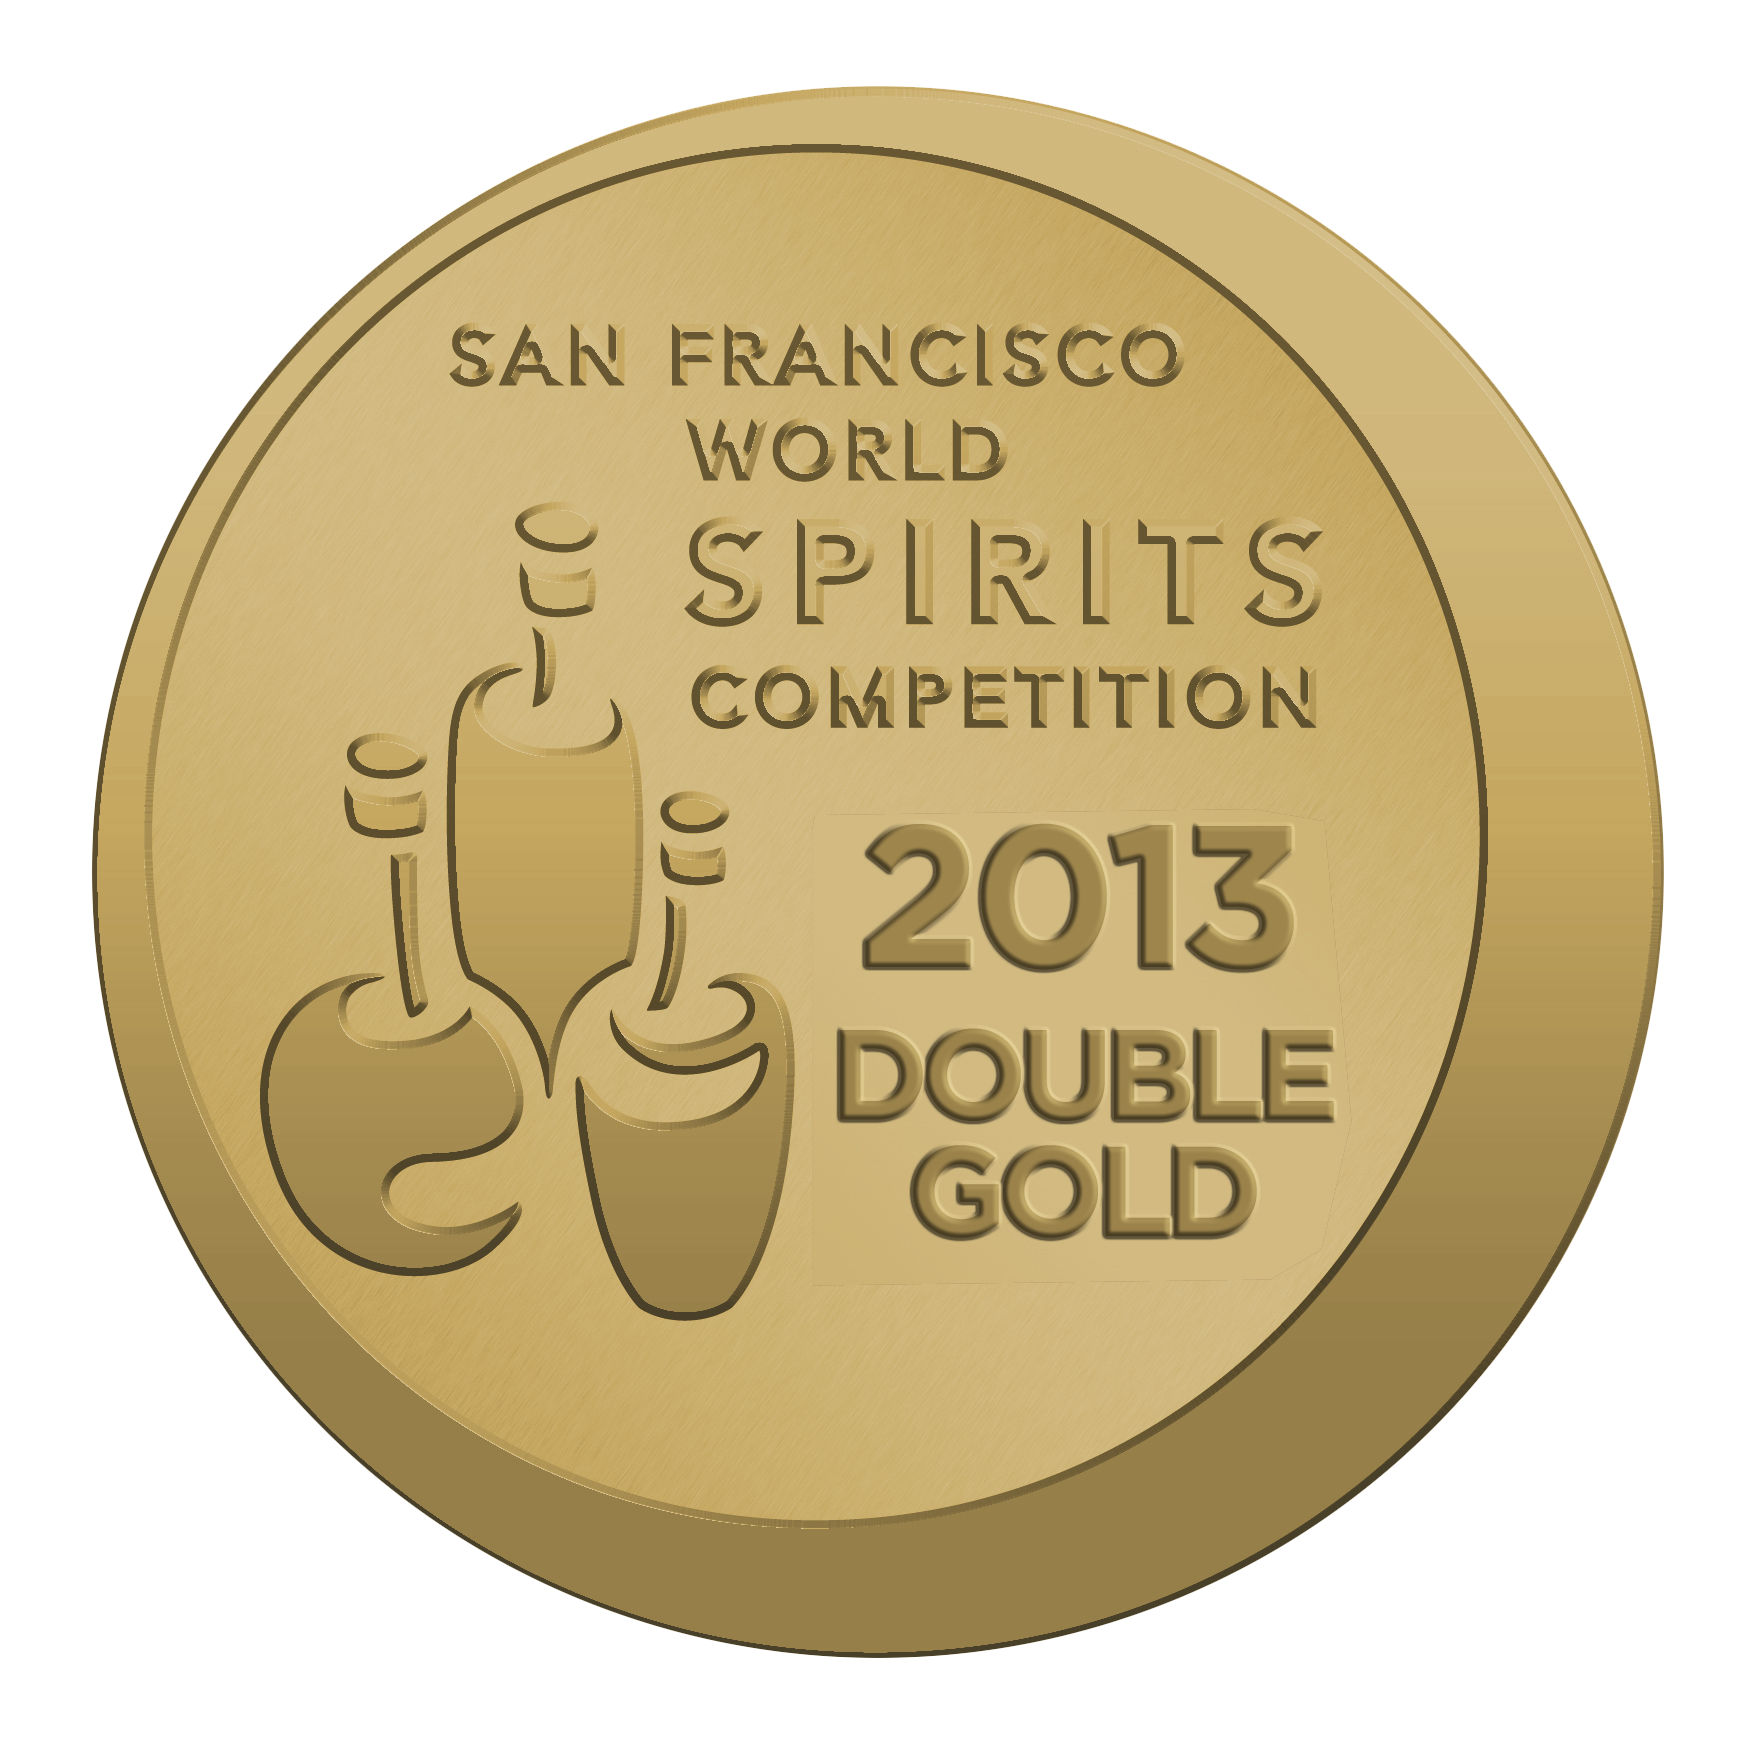 San Francisco World Spirits Competition 2013